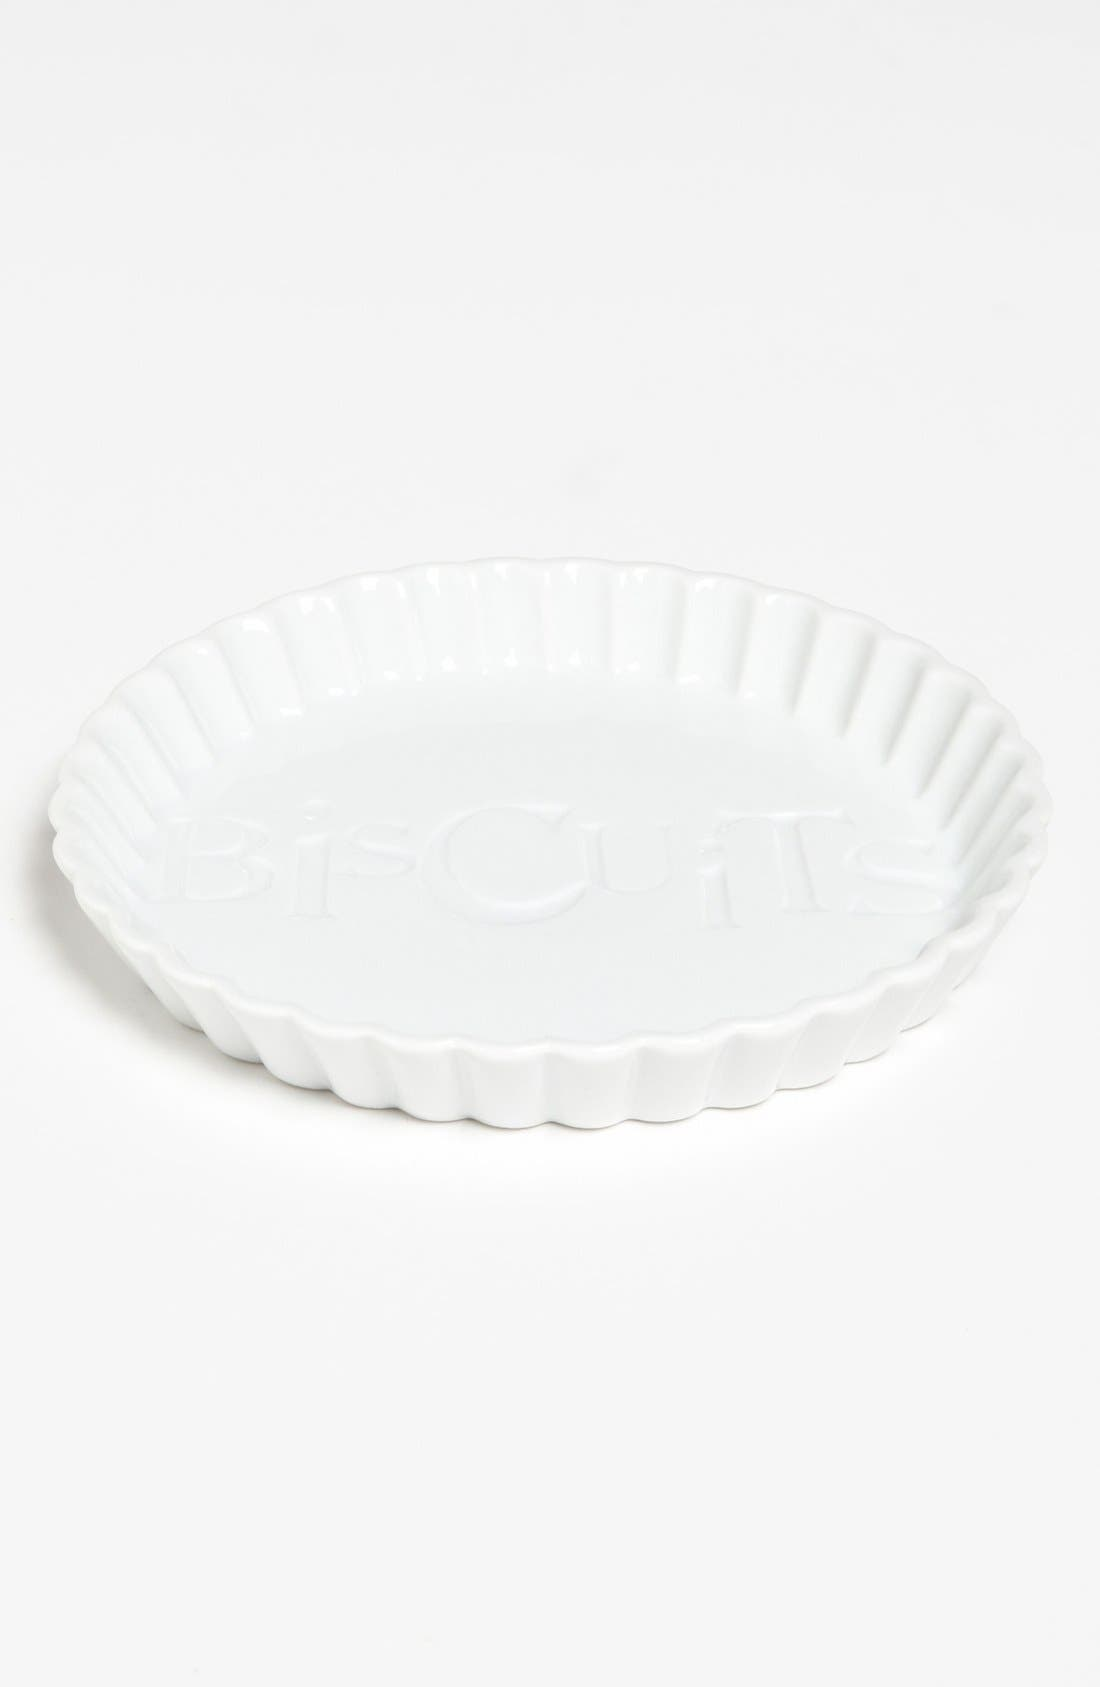 Main Image - Rosanna 'Savour - Biscuits' Porcelain Dish